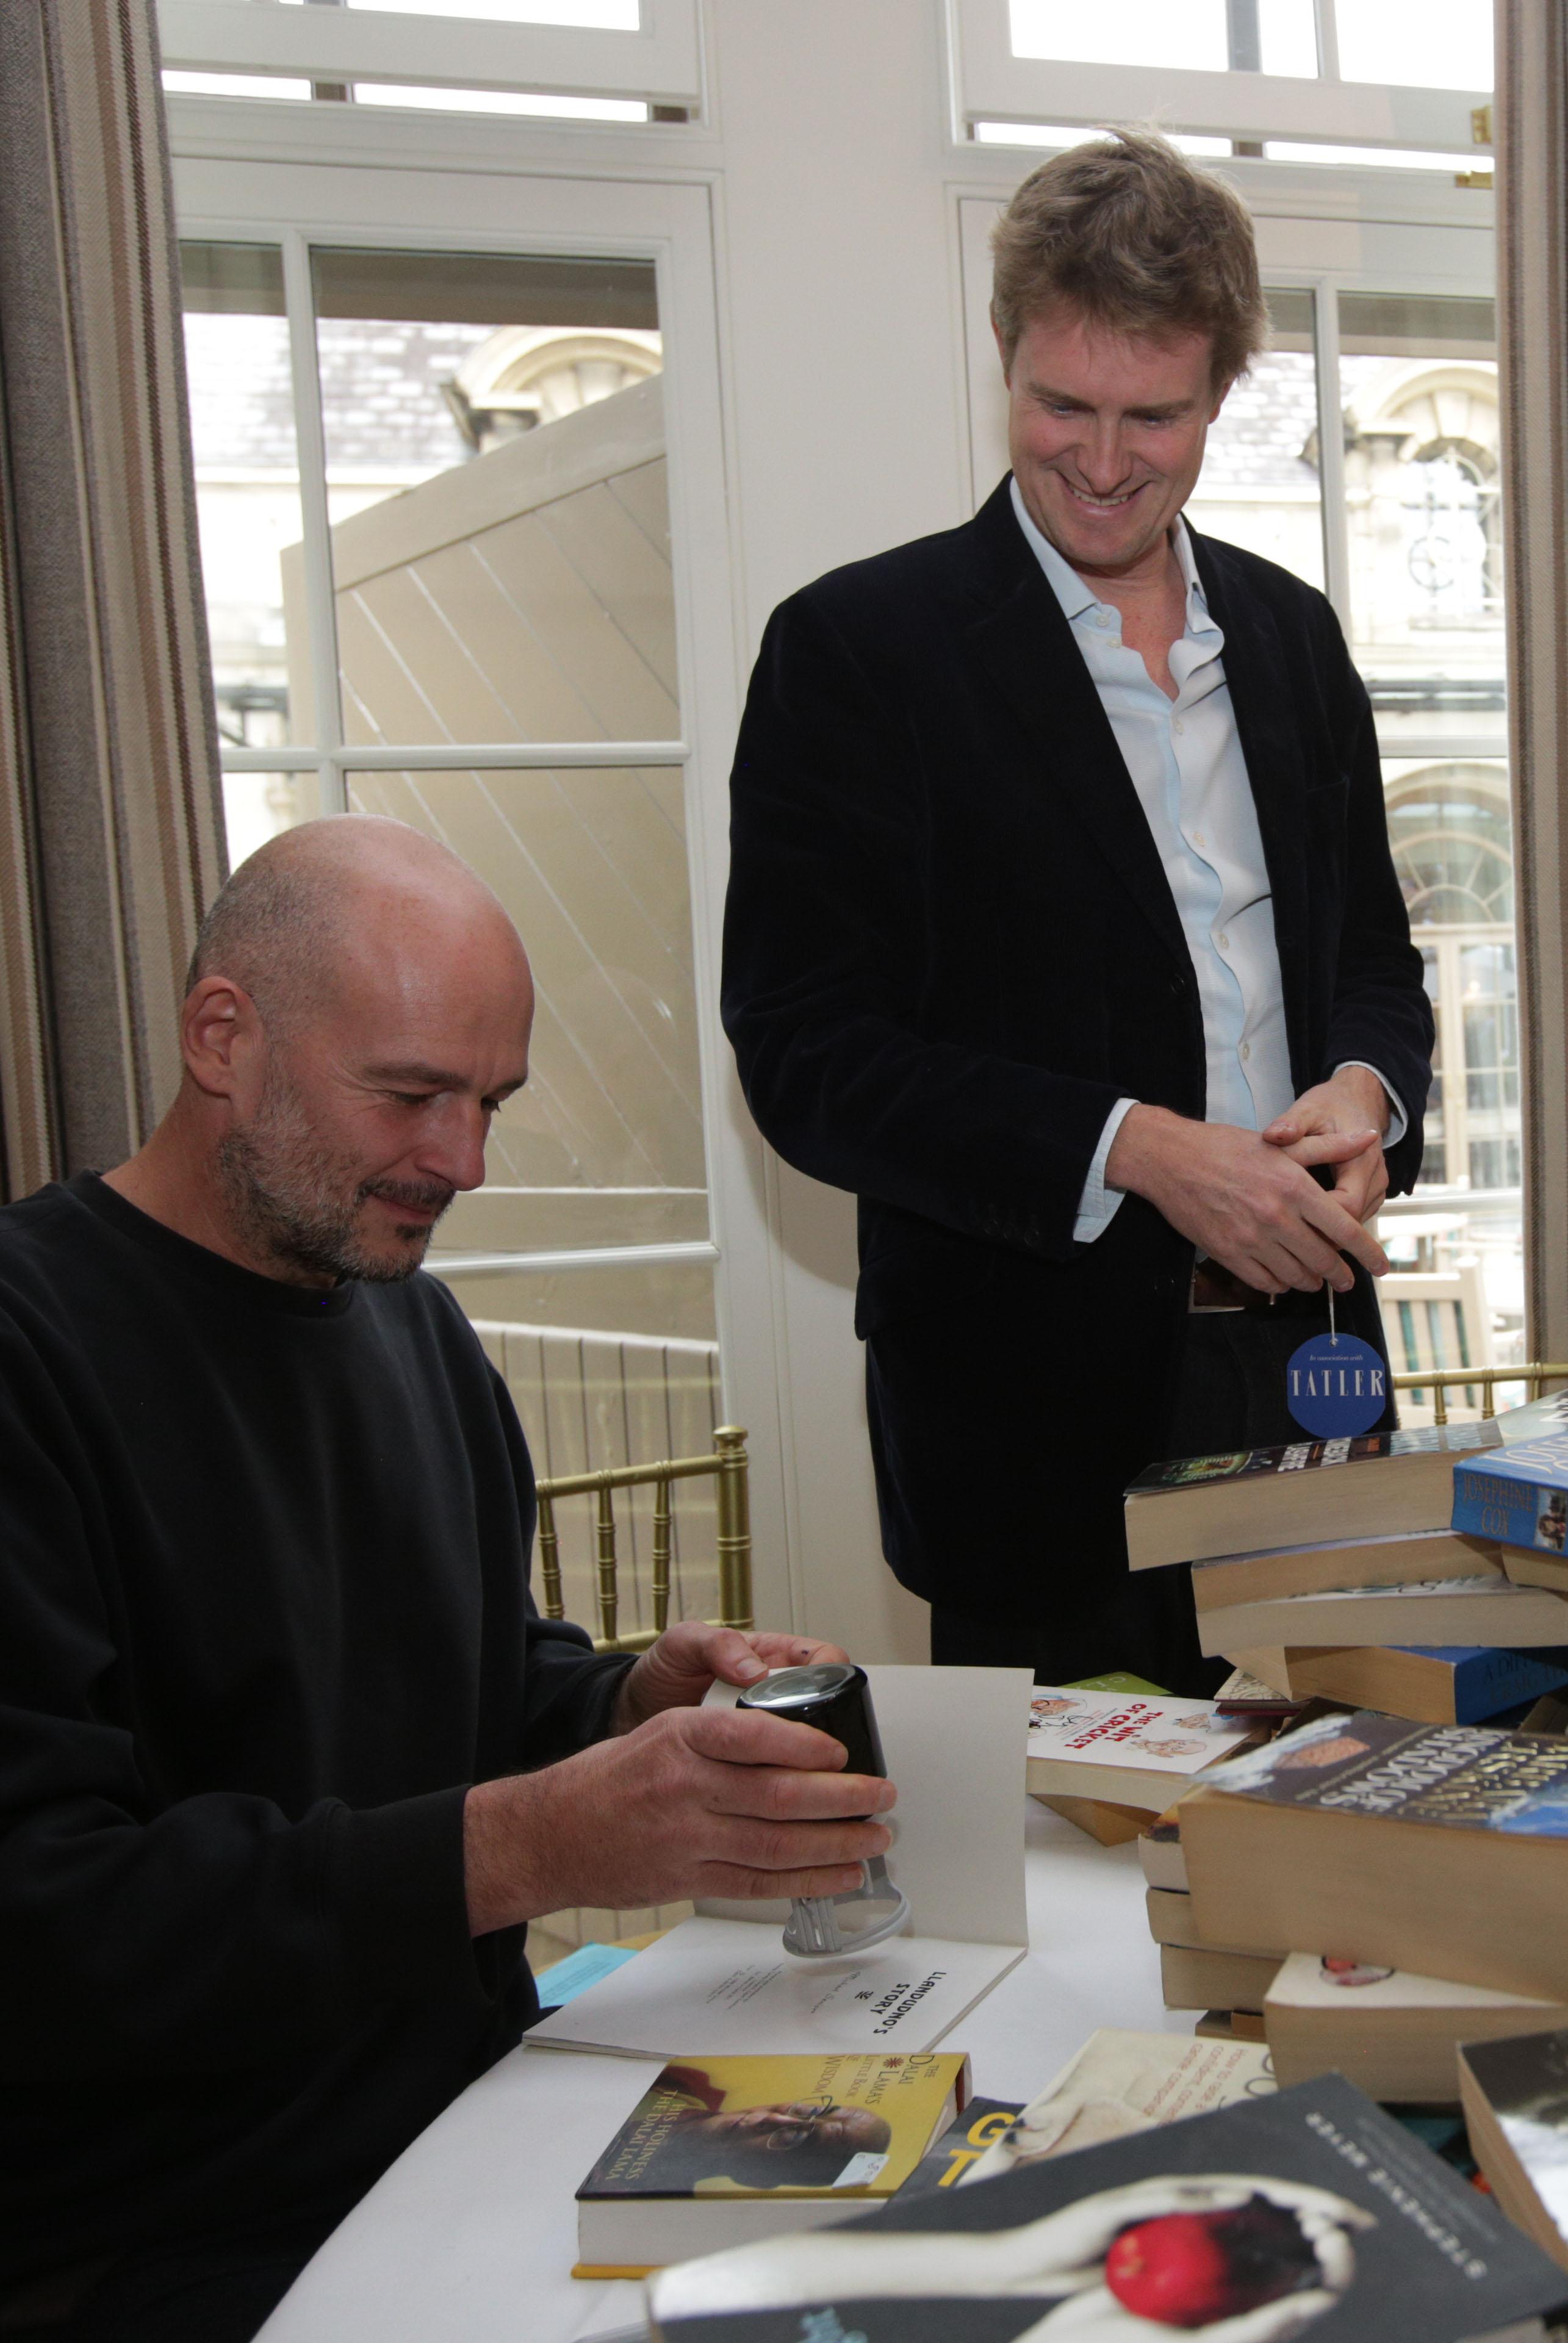 Jake Chapman signs books for Tristram Hunt at Cliveden Literary Festival